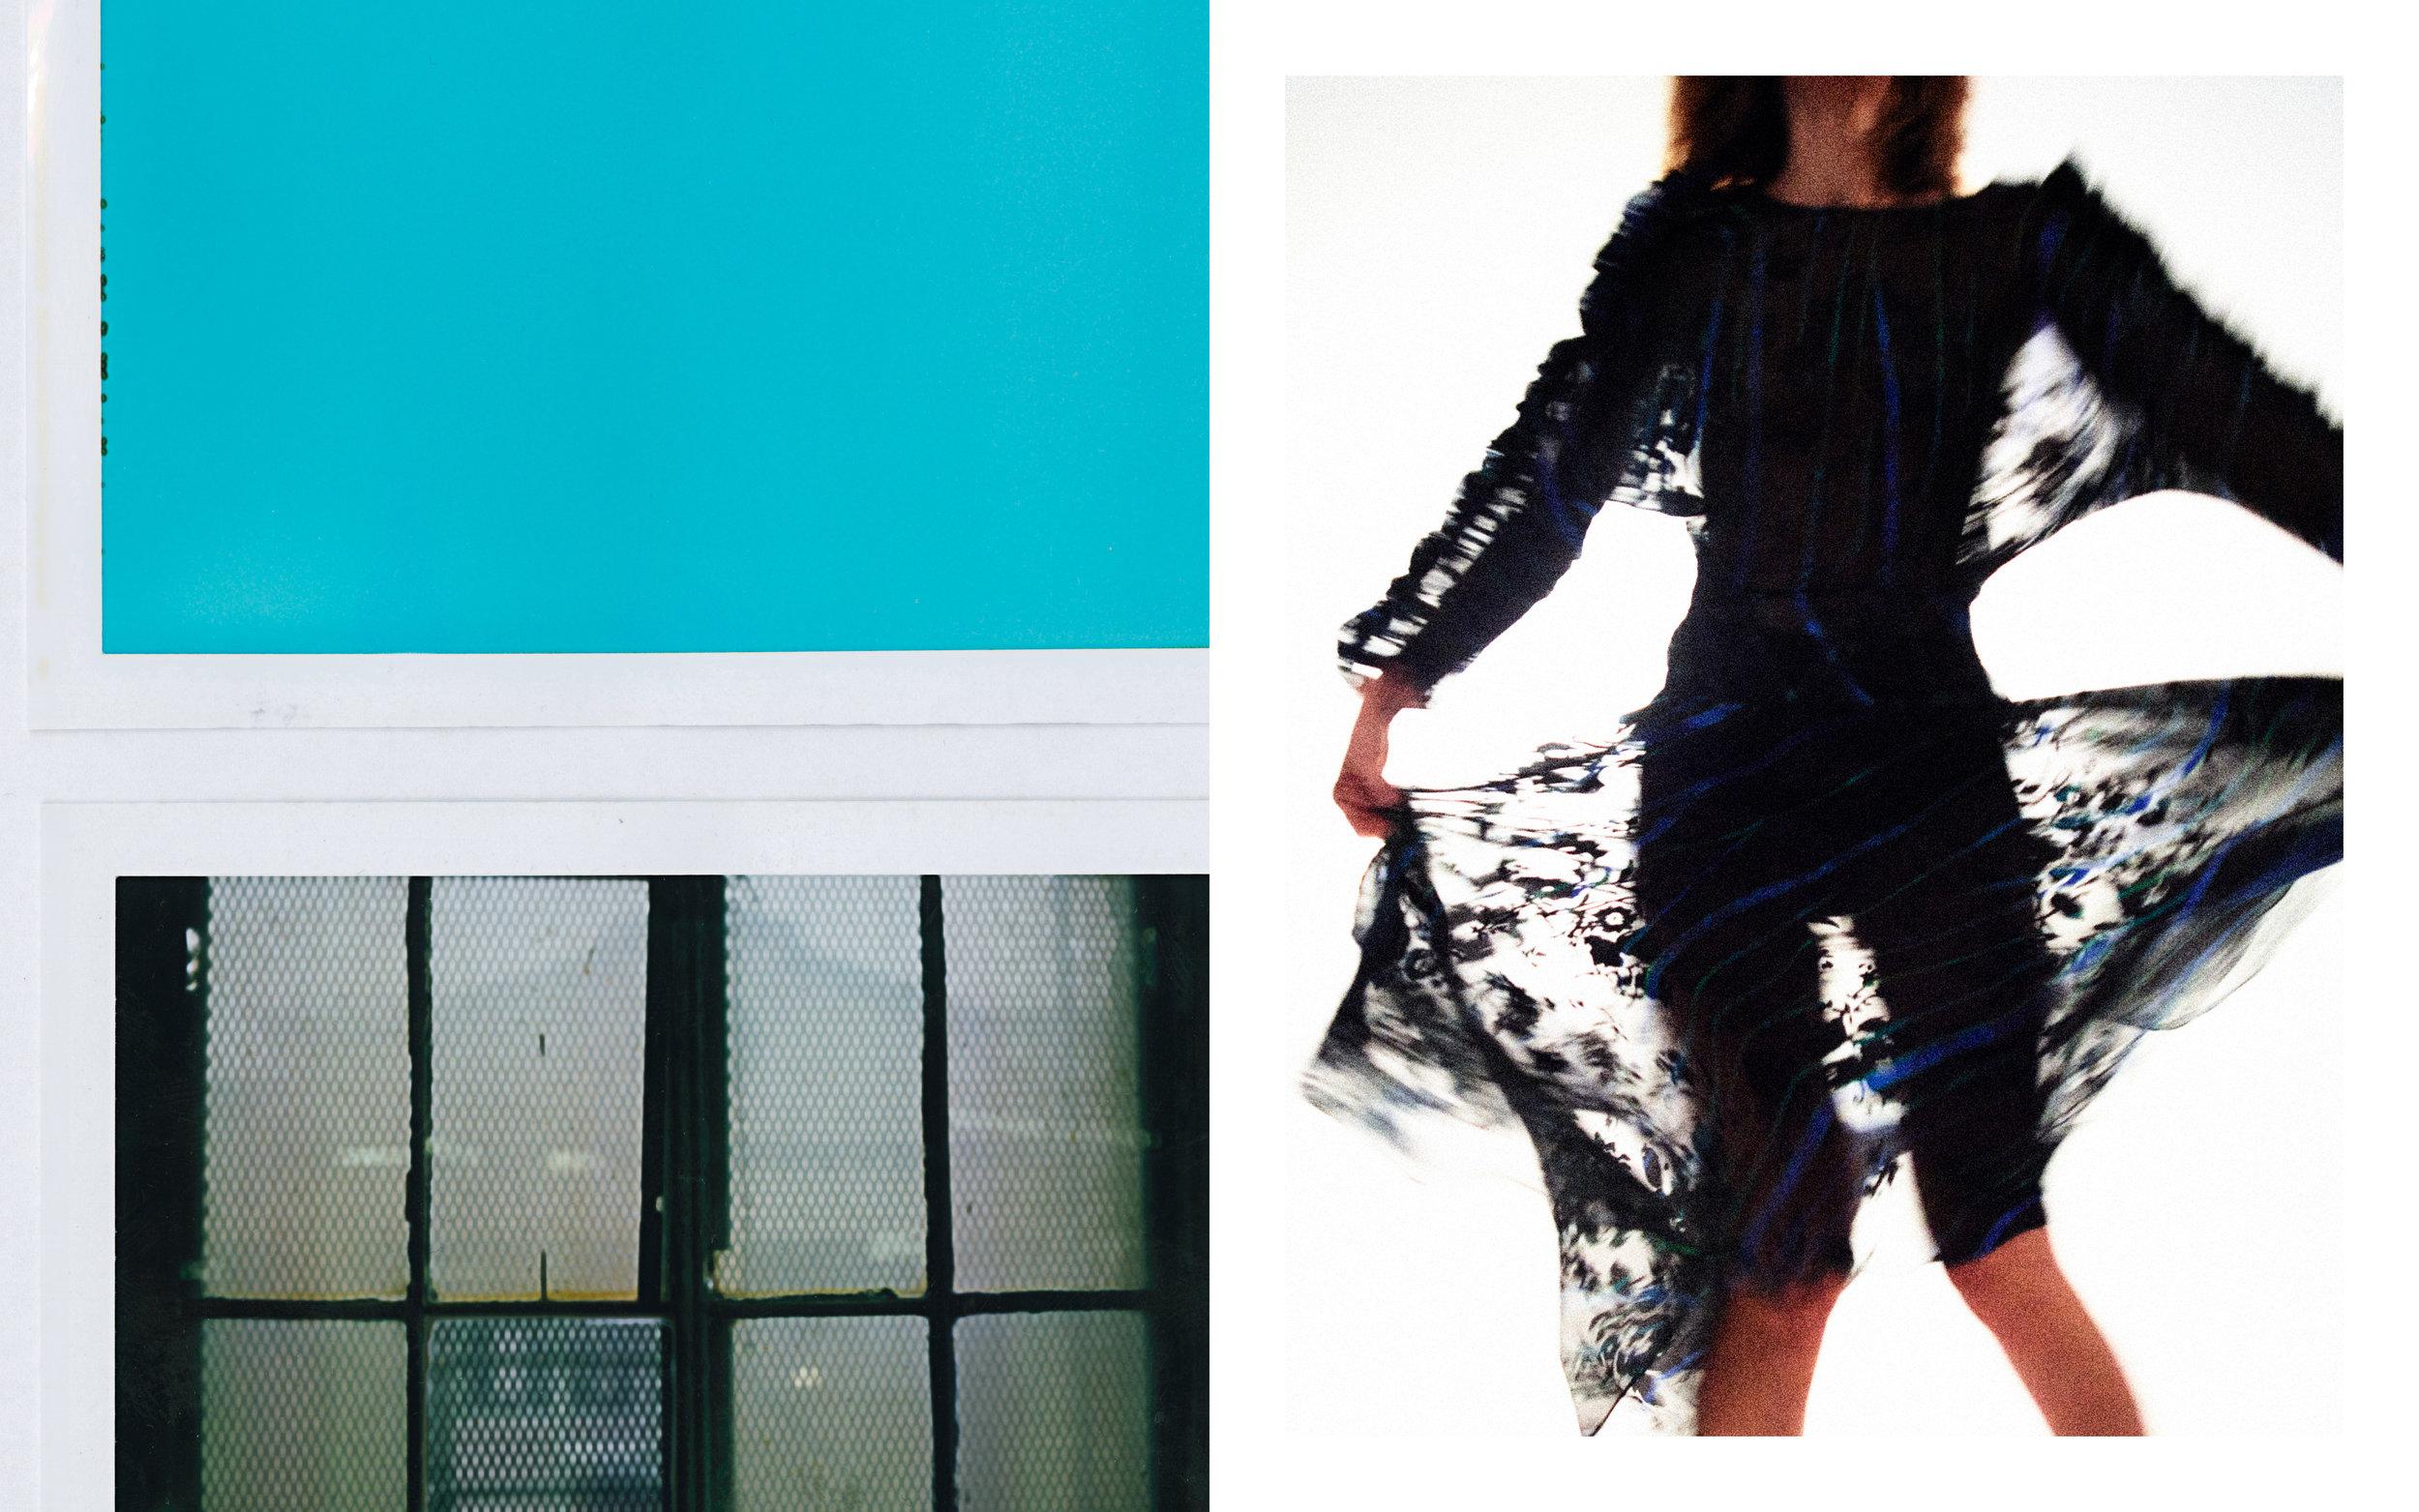 Dress; Preen by Thornton Bregazzi